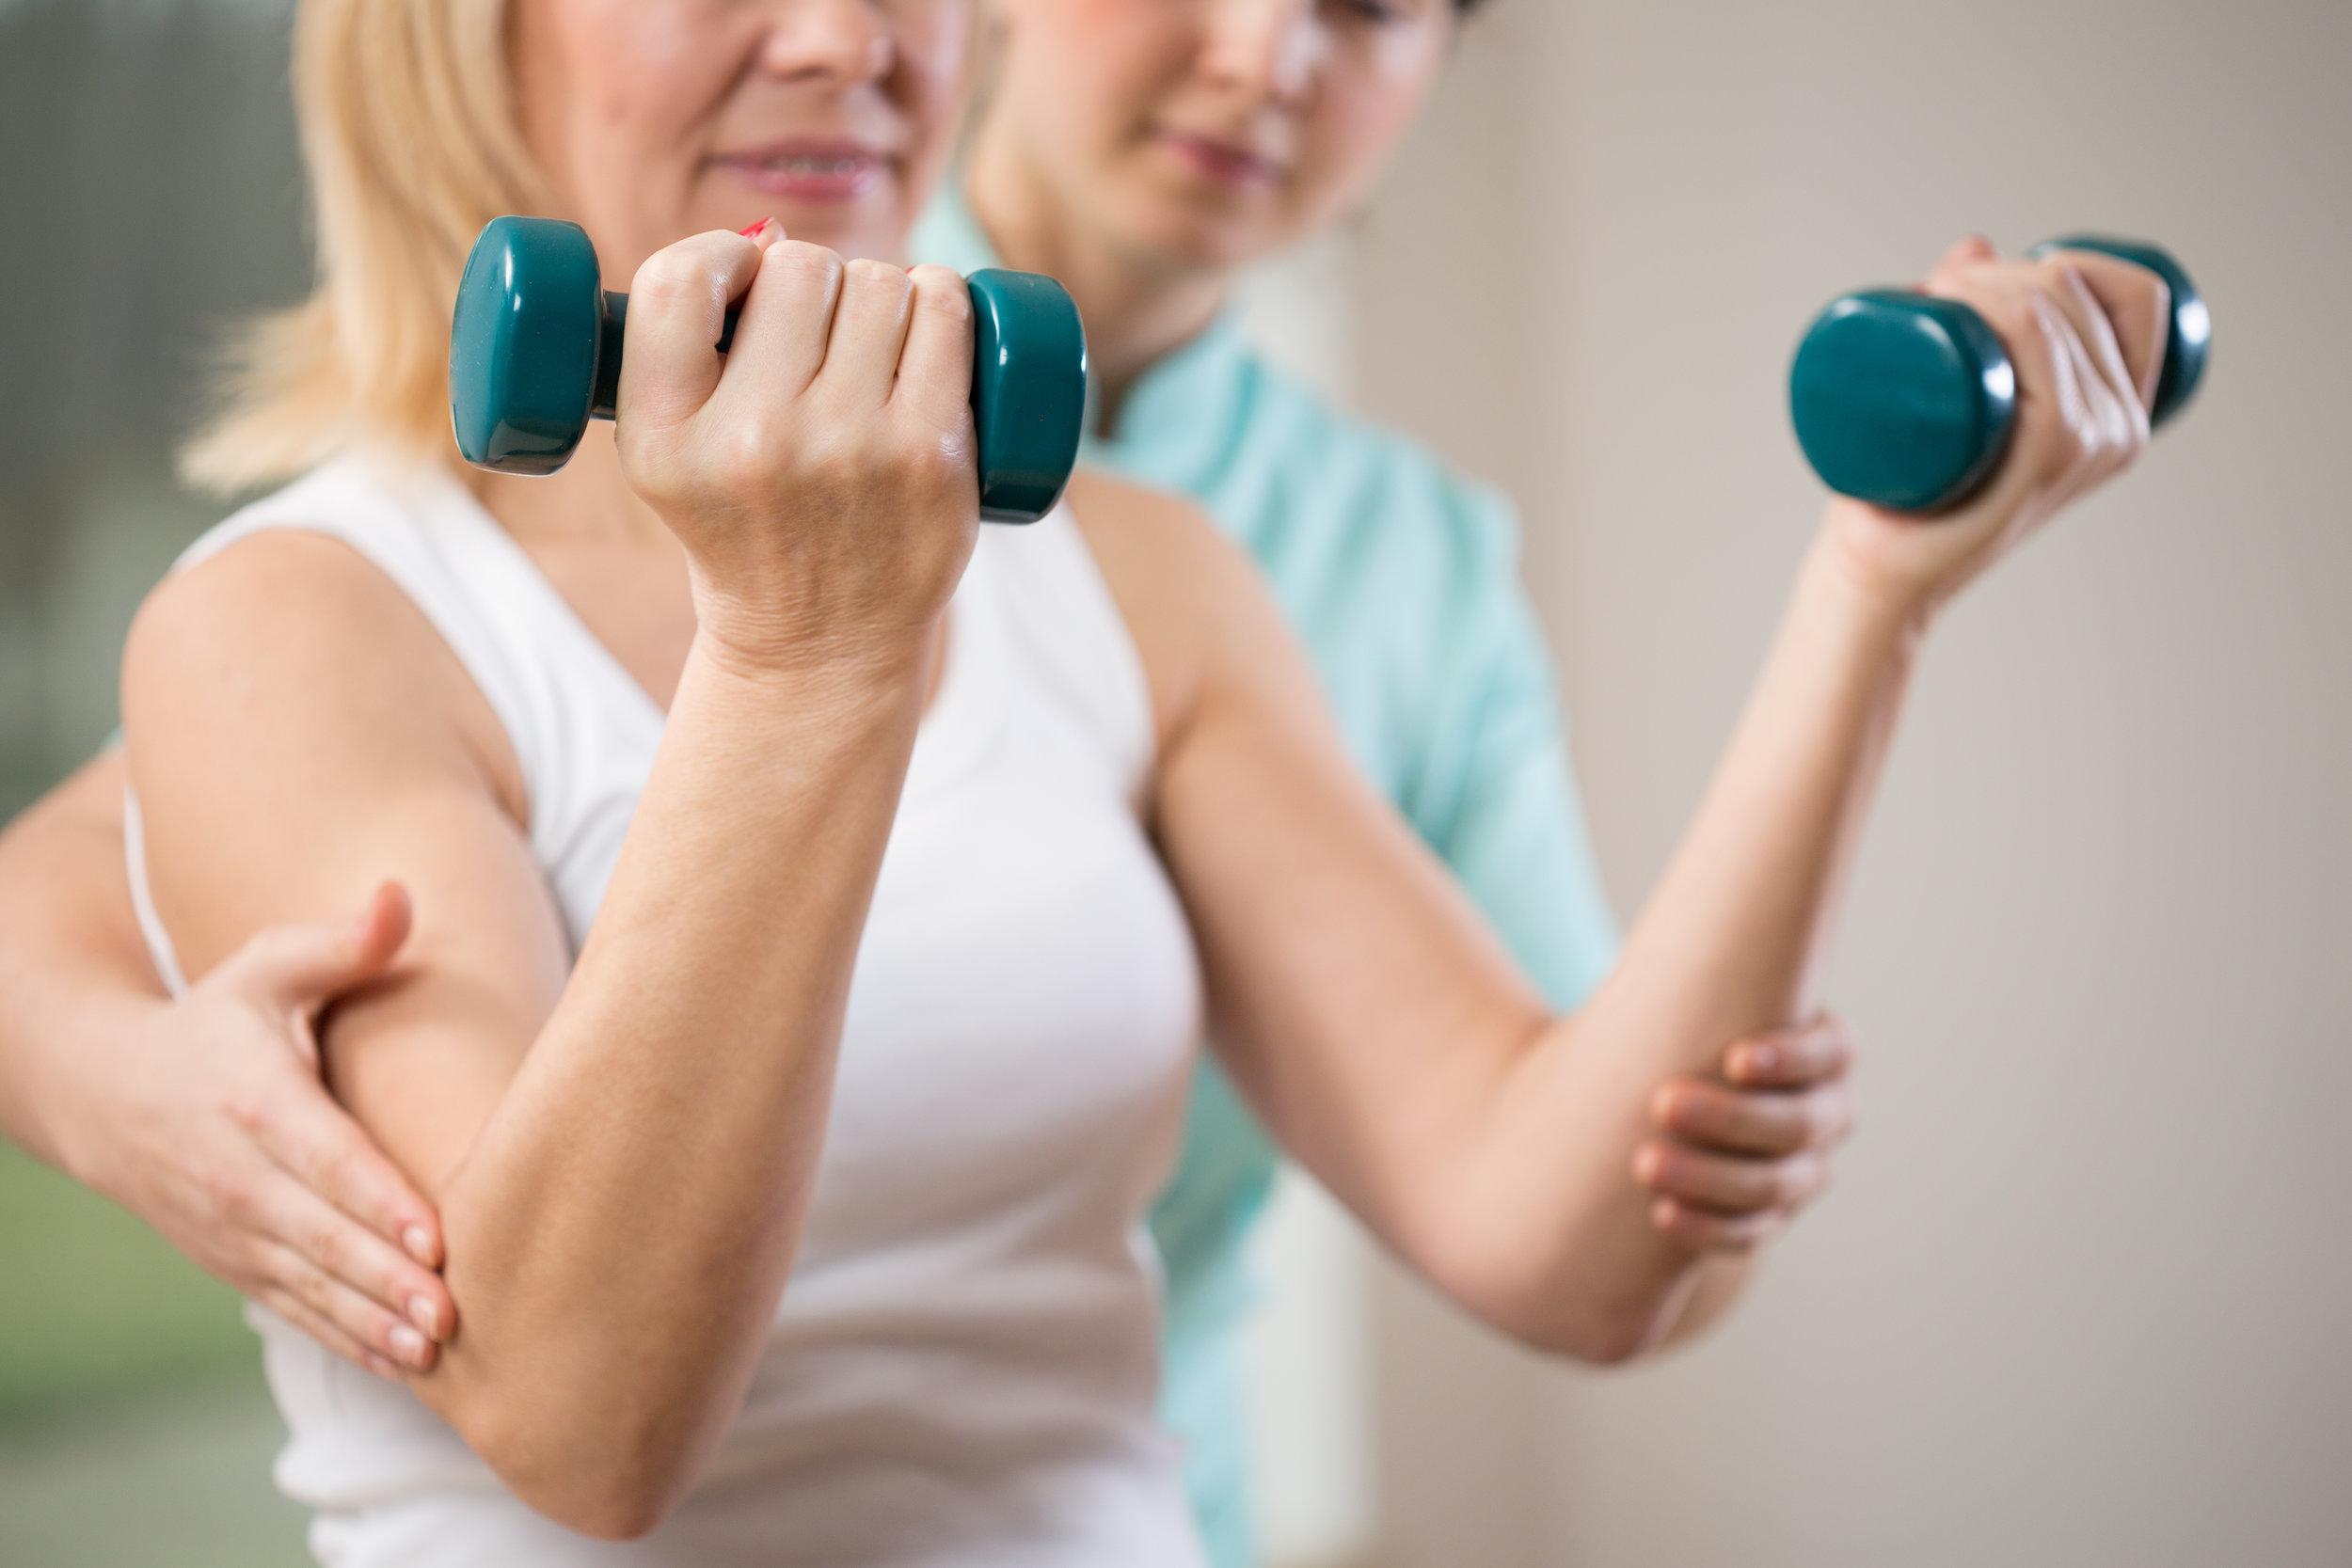 Physical Therapy - Orthopedic pain, fibromyalgia, diastasis recti and other chronic pain help